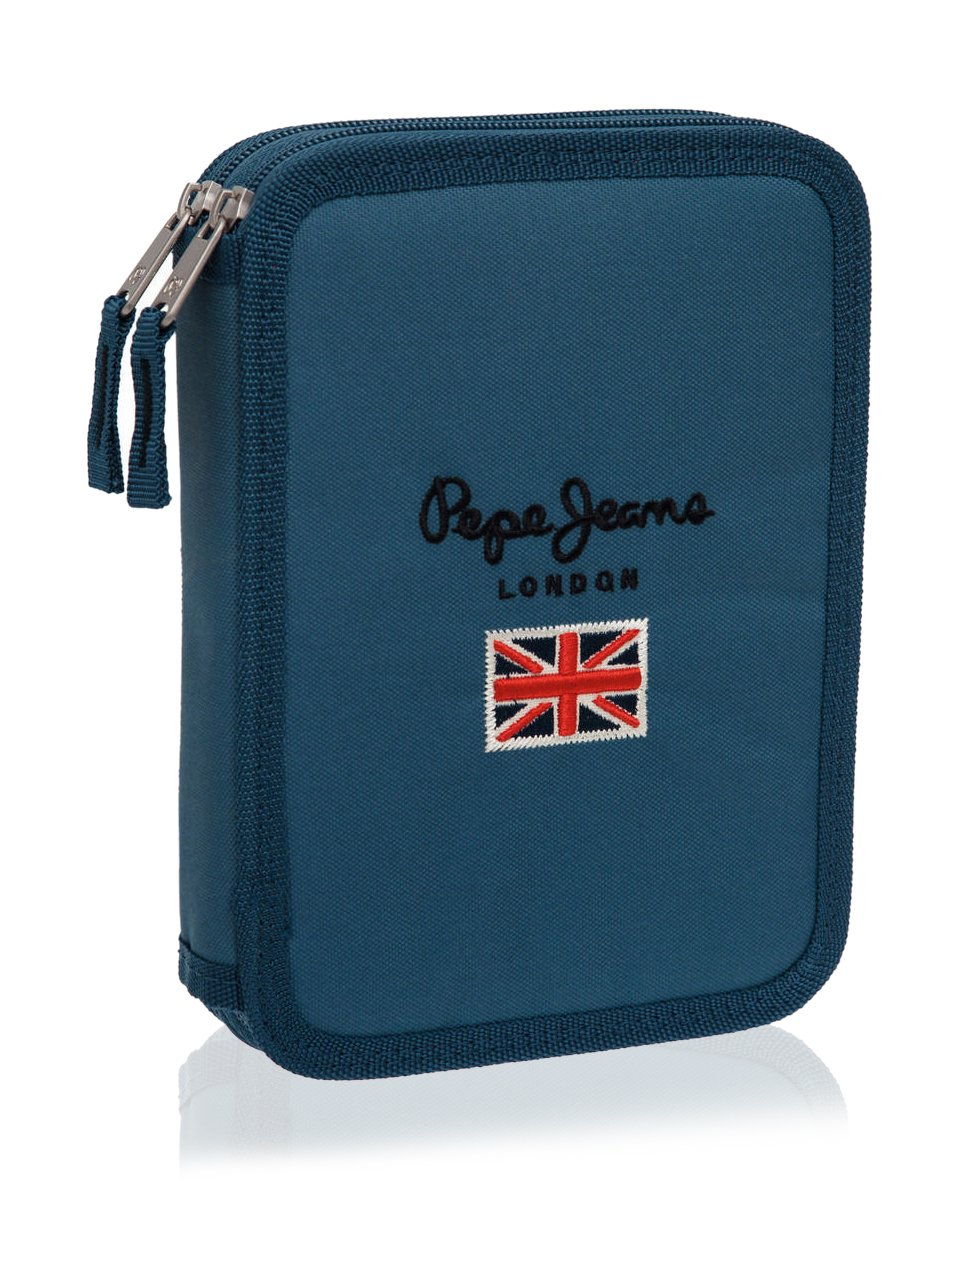 Pepe Jeans Original Blue Koffer 1.3 Liter Blau 6049251 6049251_Azul